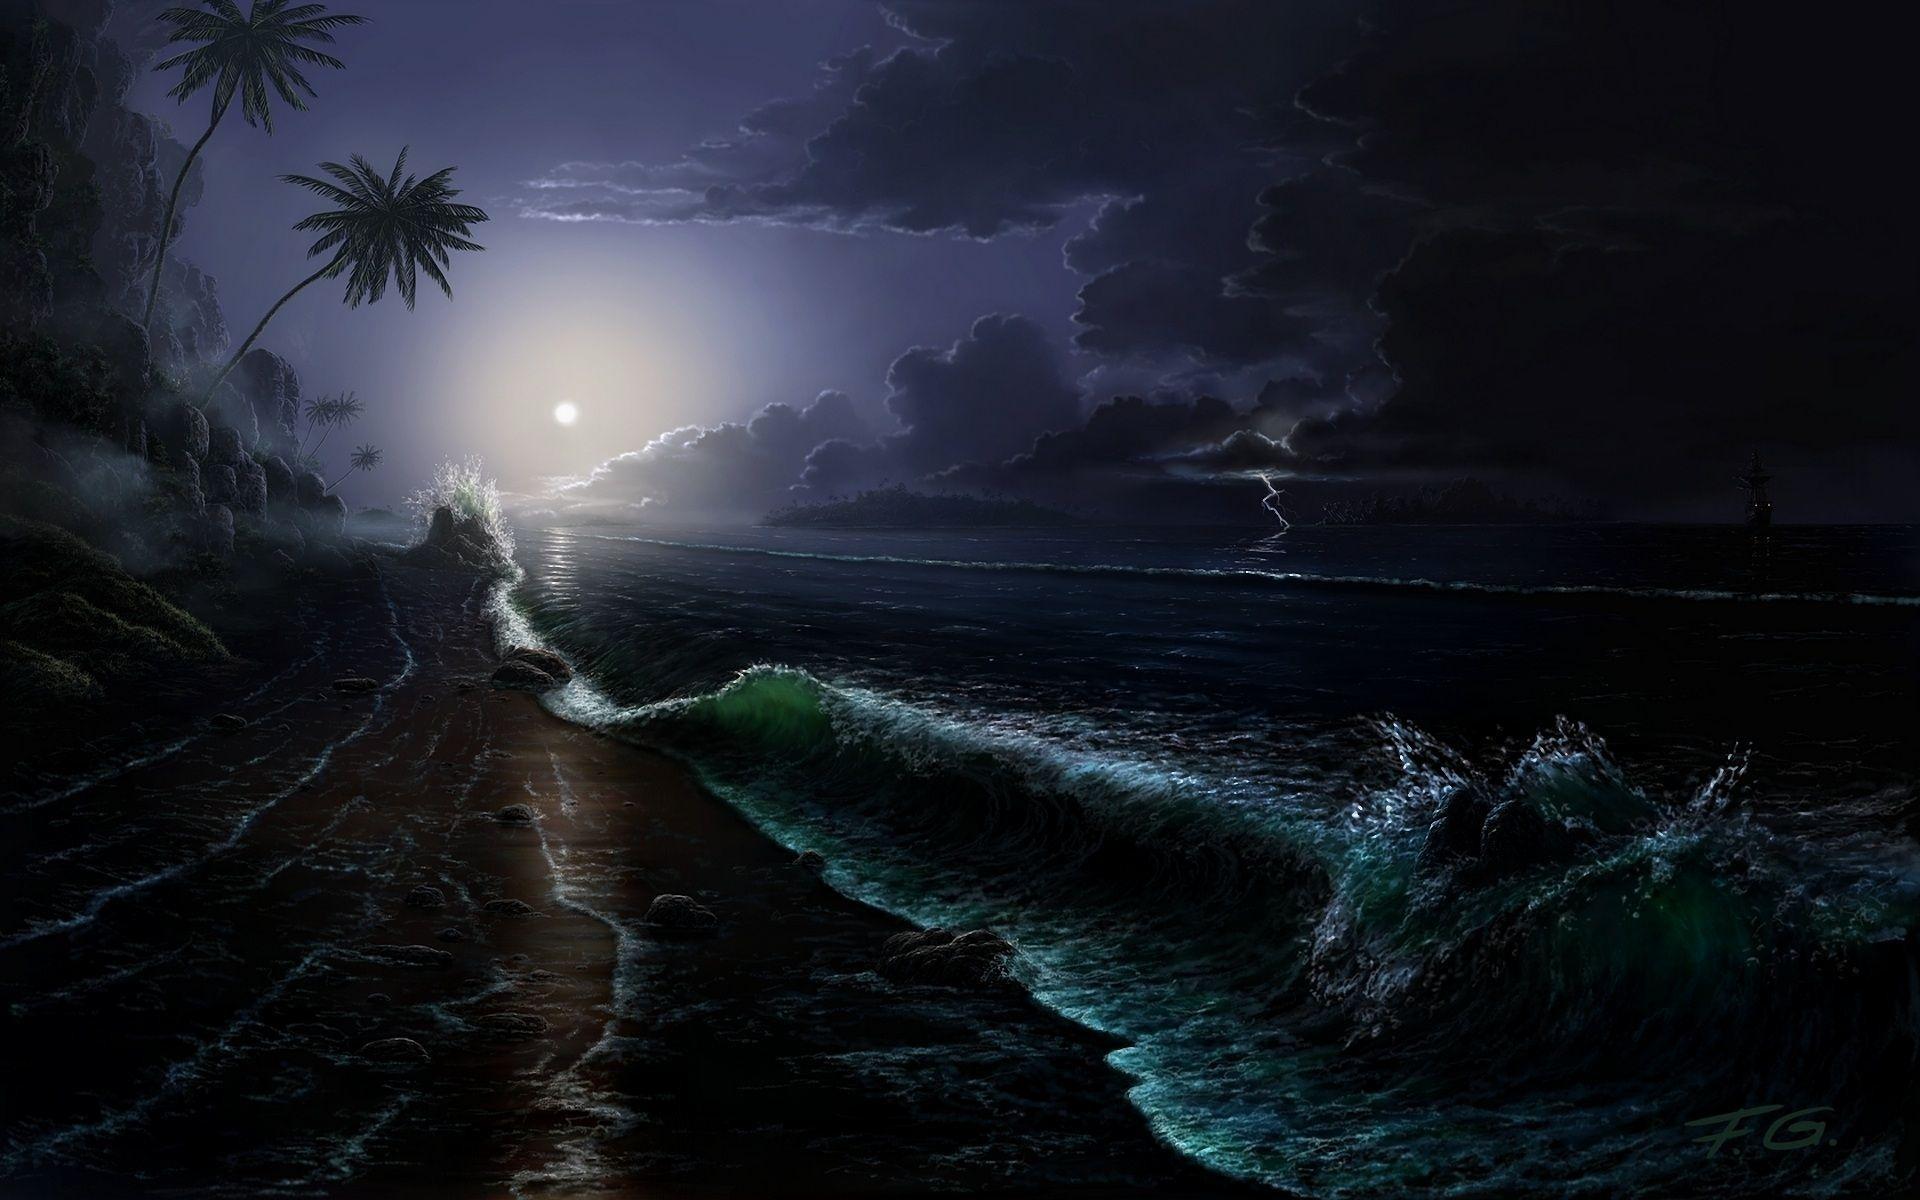 wallpaper.wiki-Free-Download-Beach-At-Night-Background-